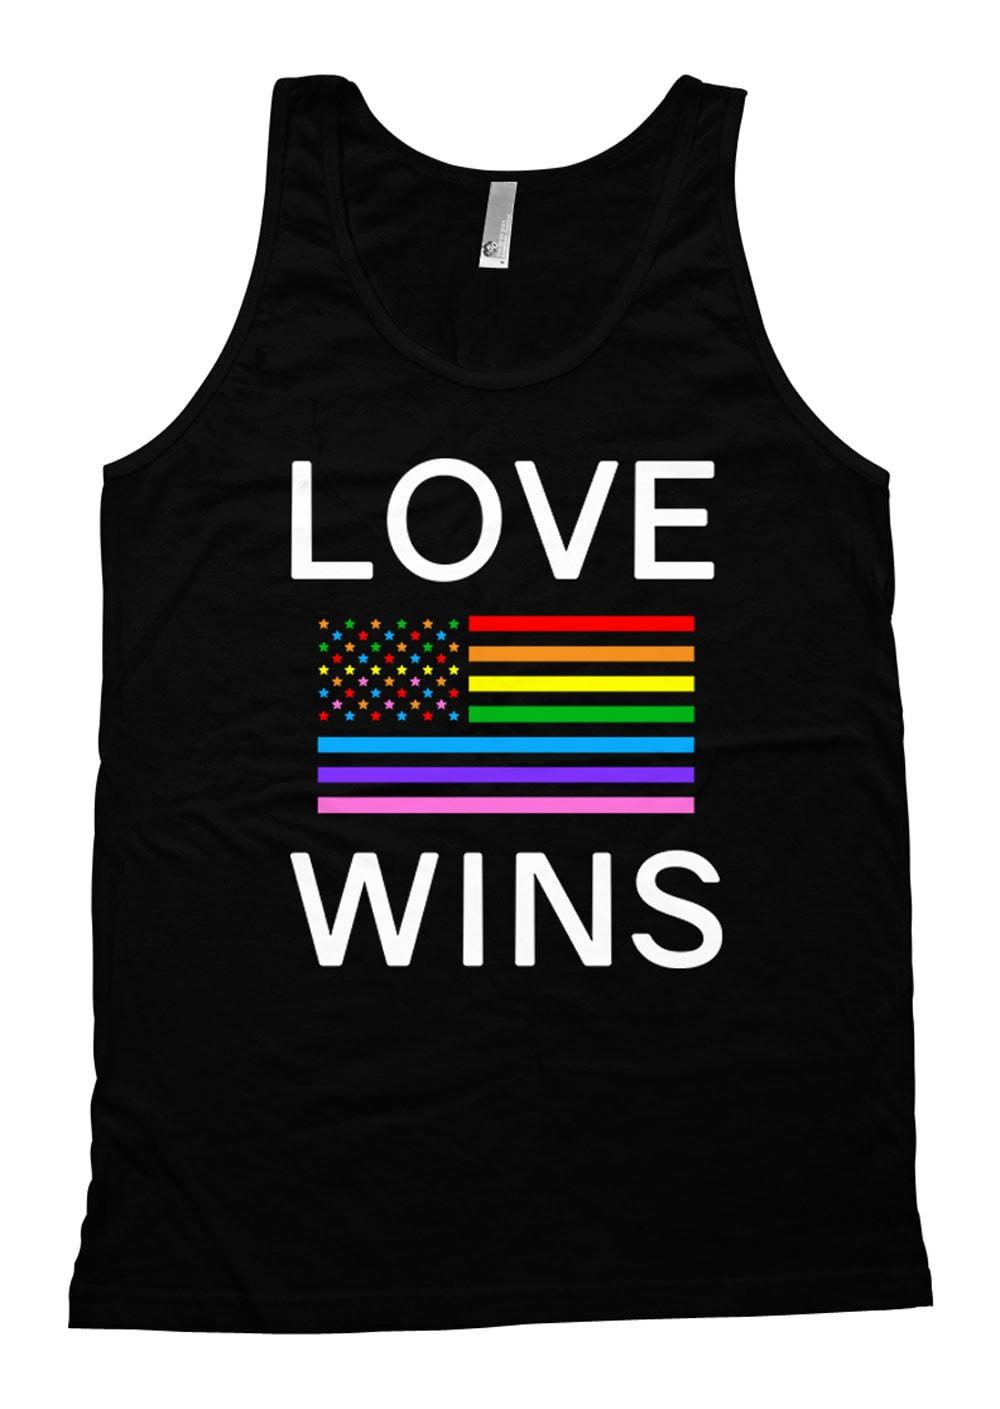 pride clothing lgbt t shirts gay pride tank lesbian shirts